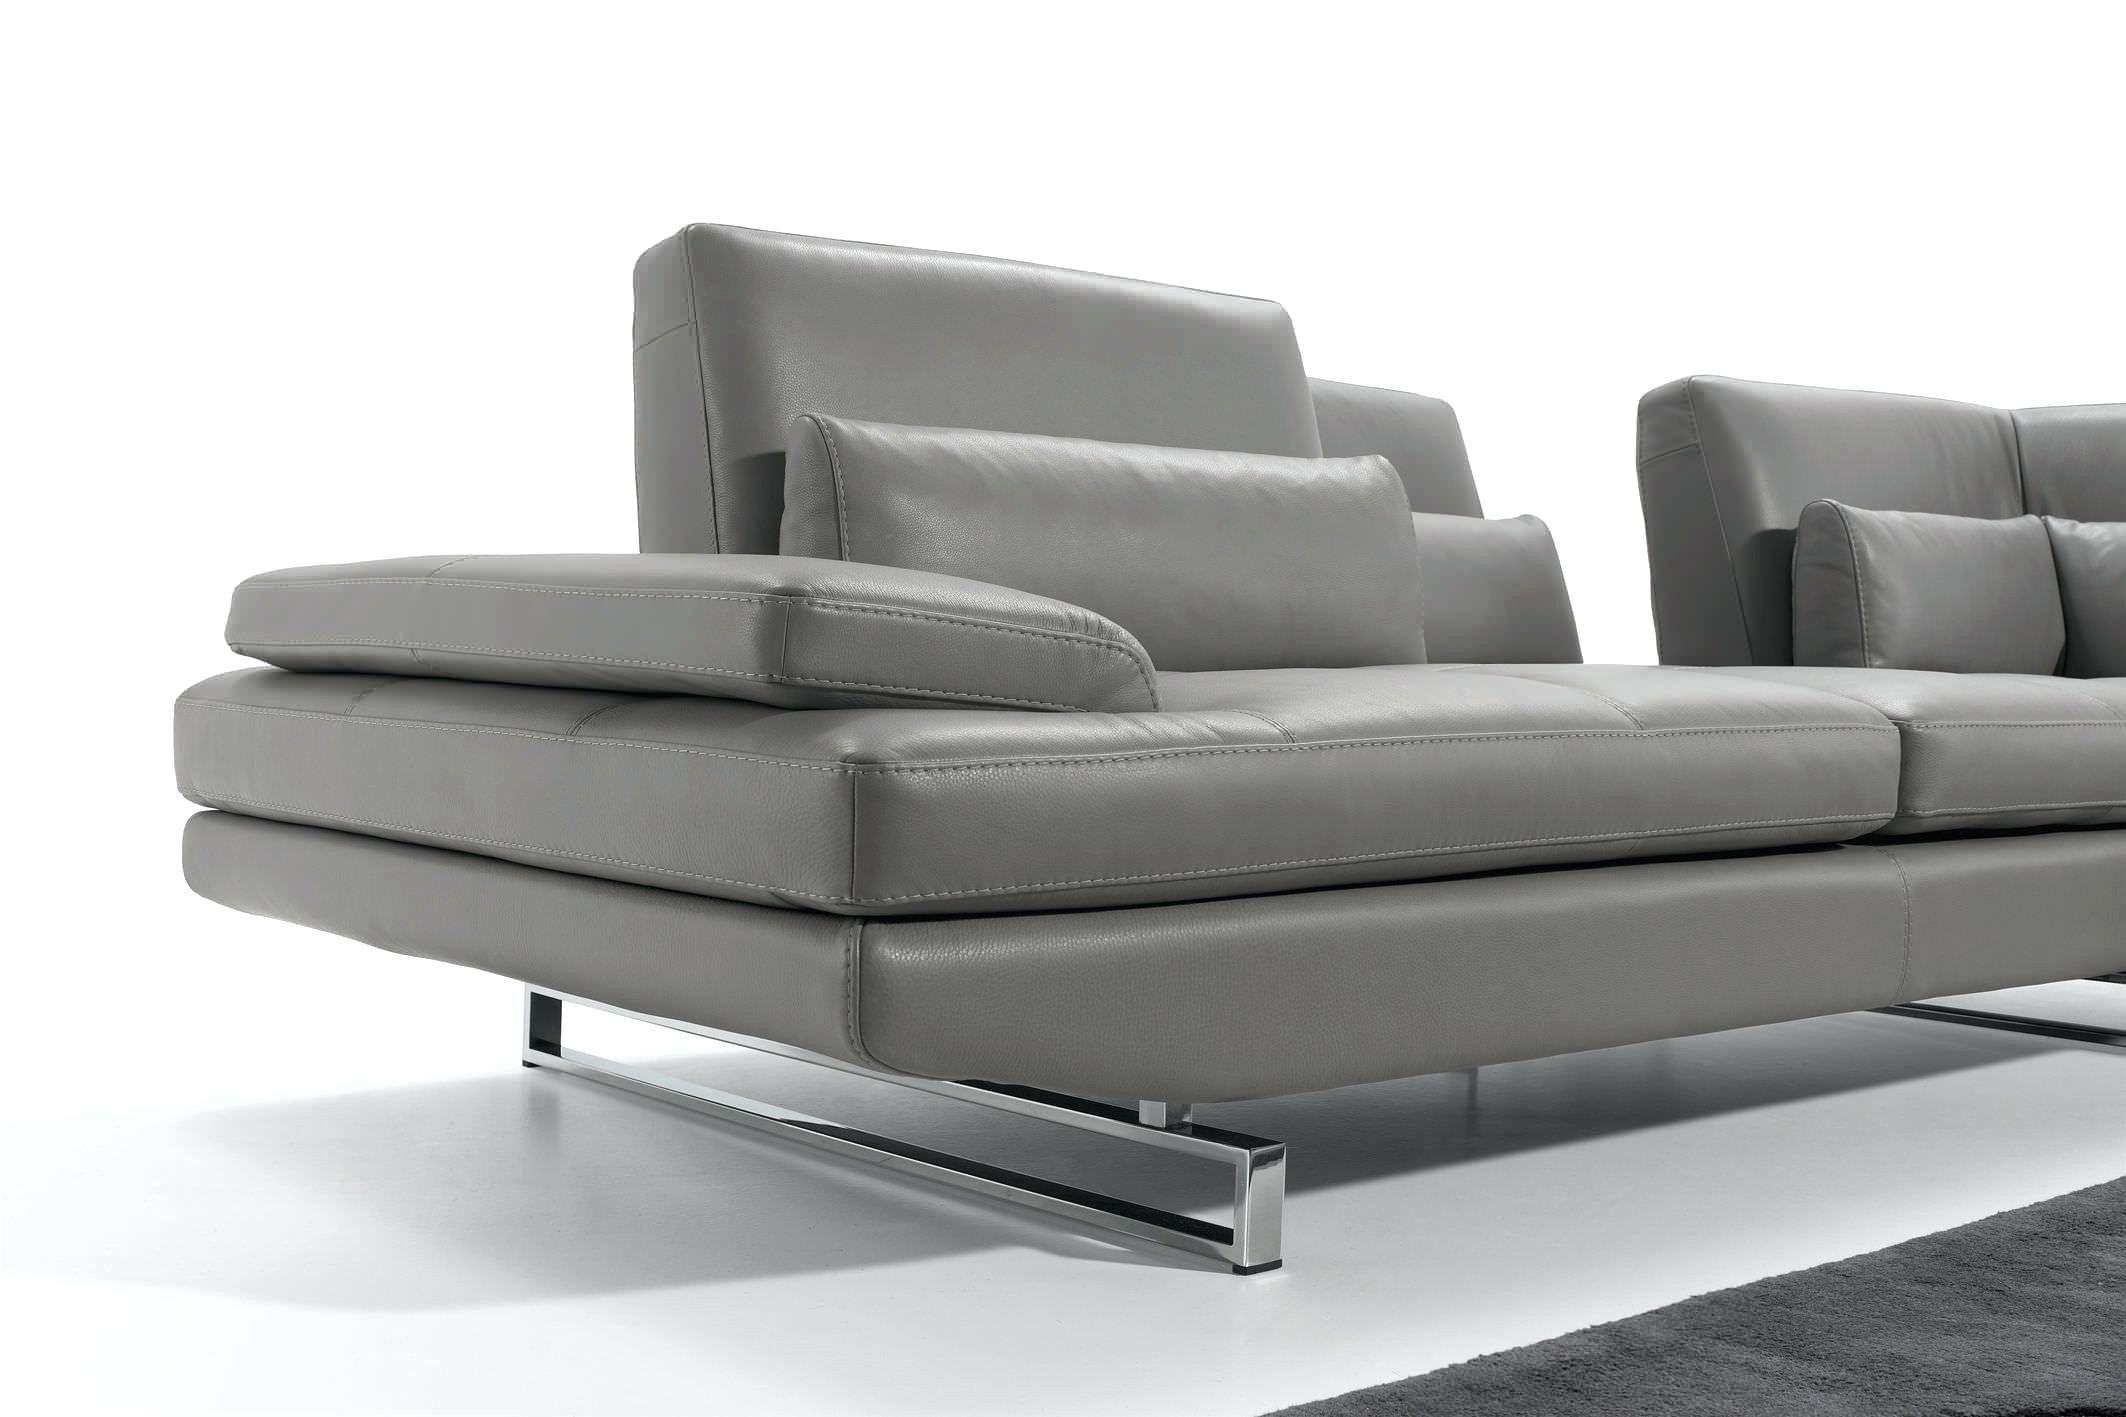 Housse Canape Ikea Ancien Modele Impressionnant Images 32 Impressionnant Canapé Fixe Convertible